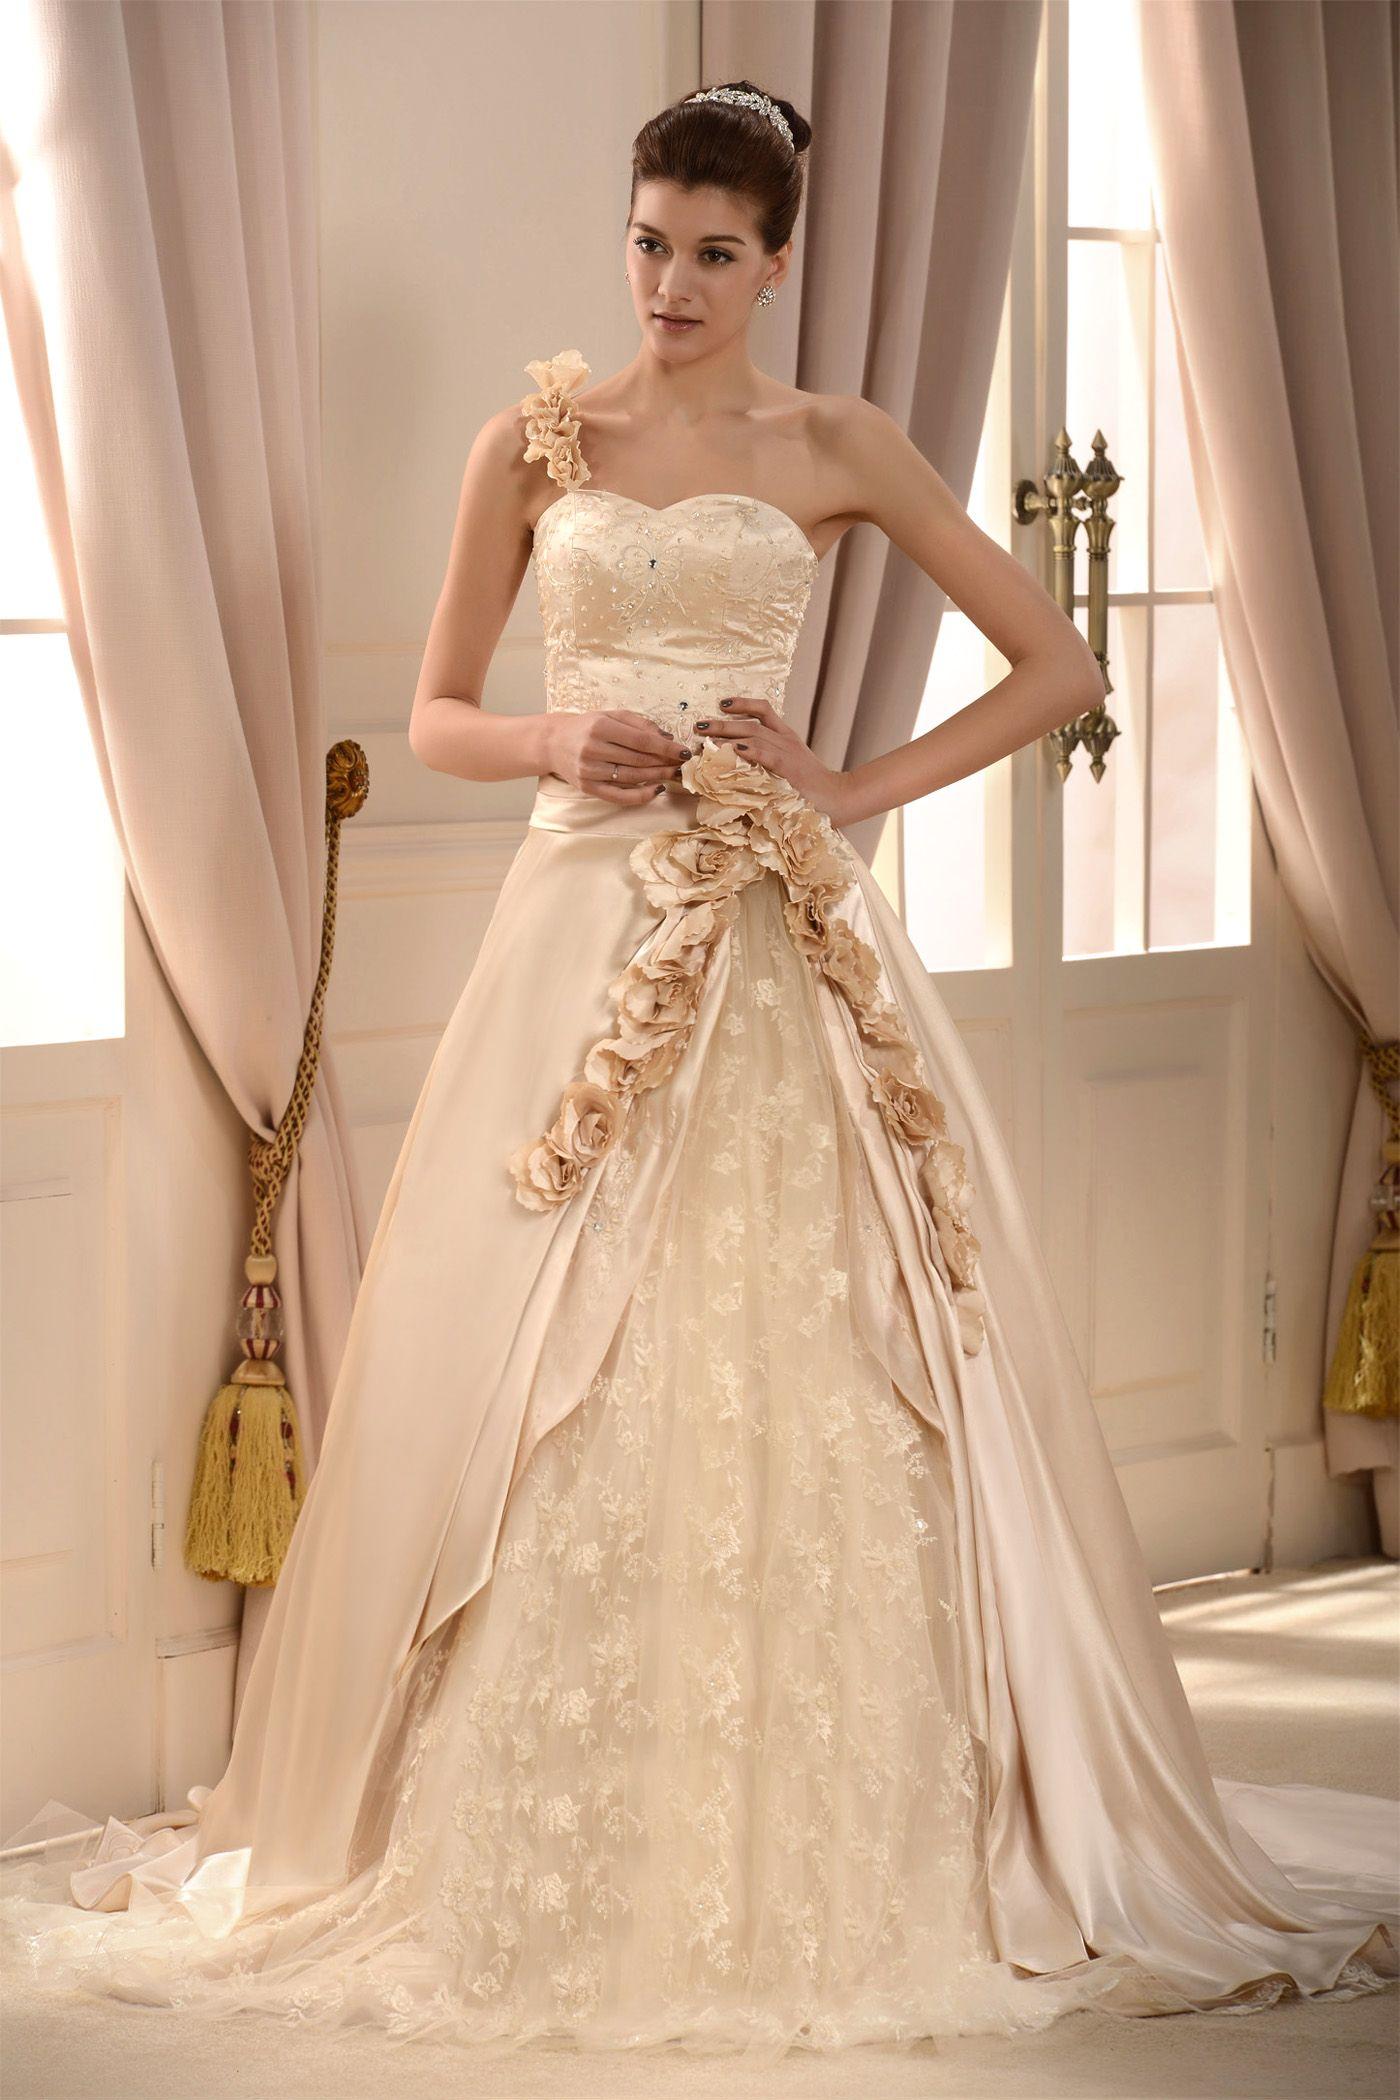 Royal wedding dress   dressv SUPPLIES Elegant Oneshoulder Ball Gown Royal